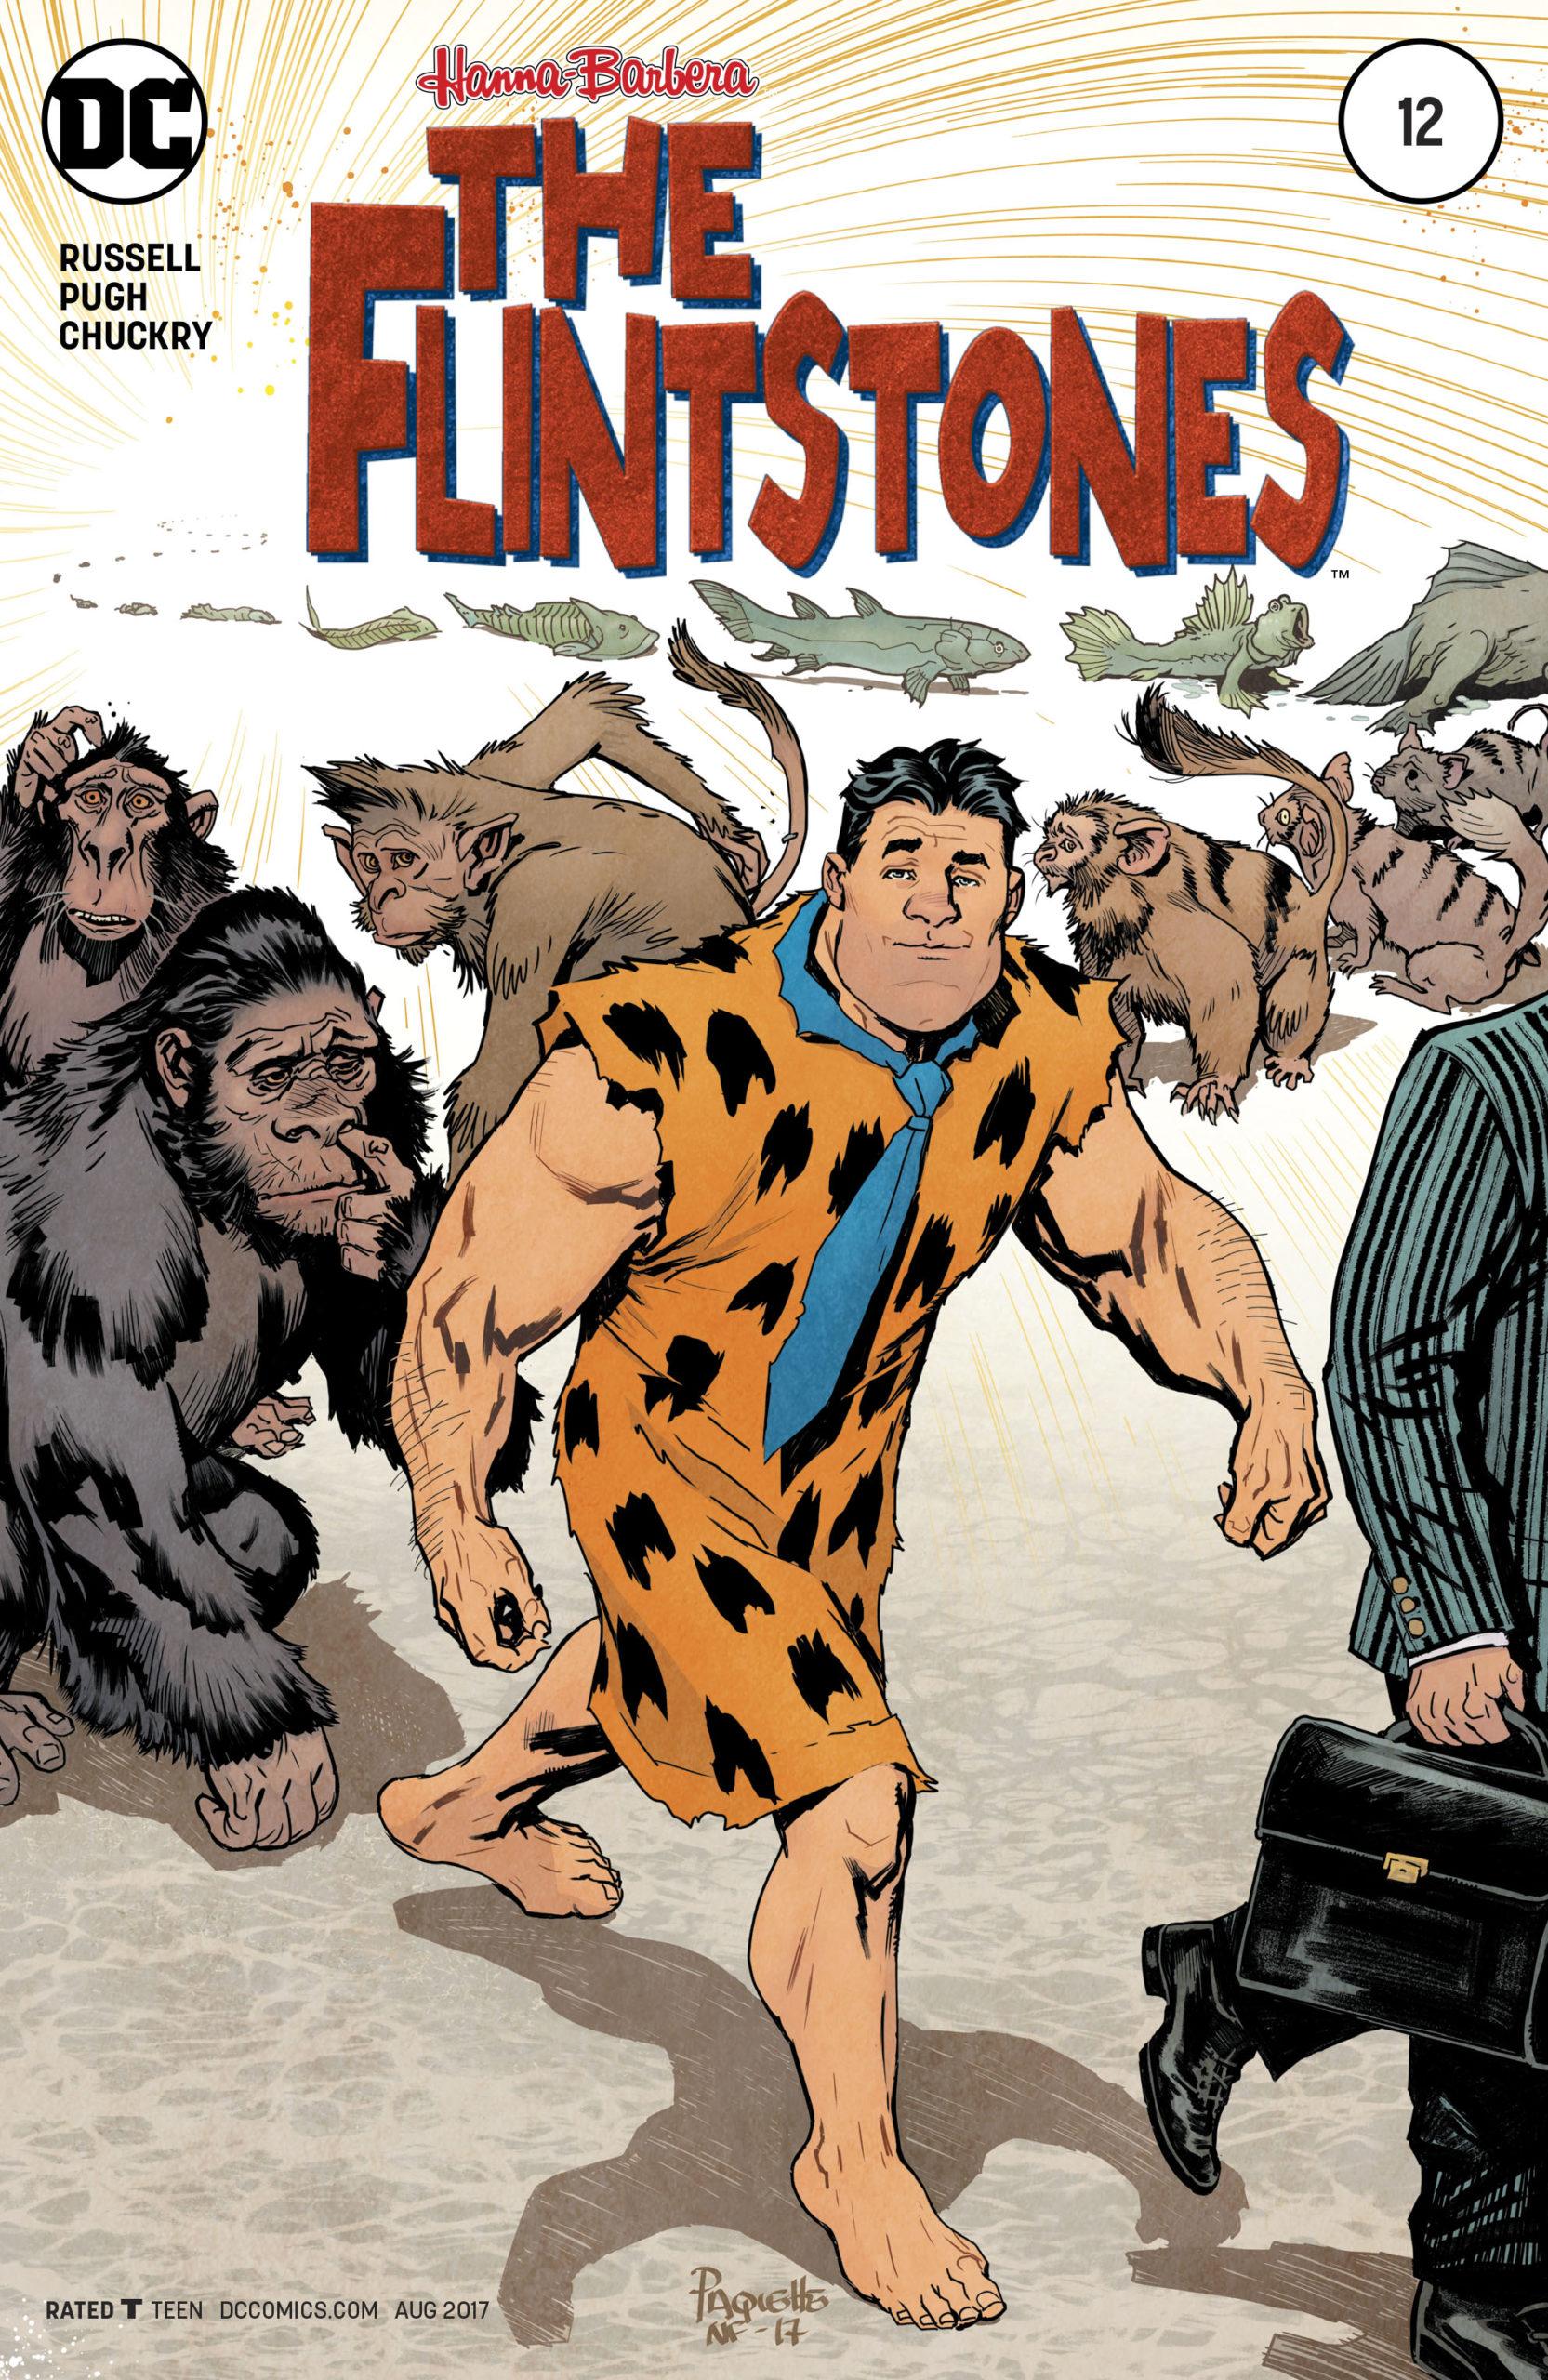 Flintstones 12 / Флинстоуны 12